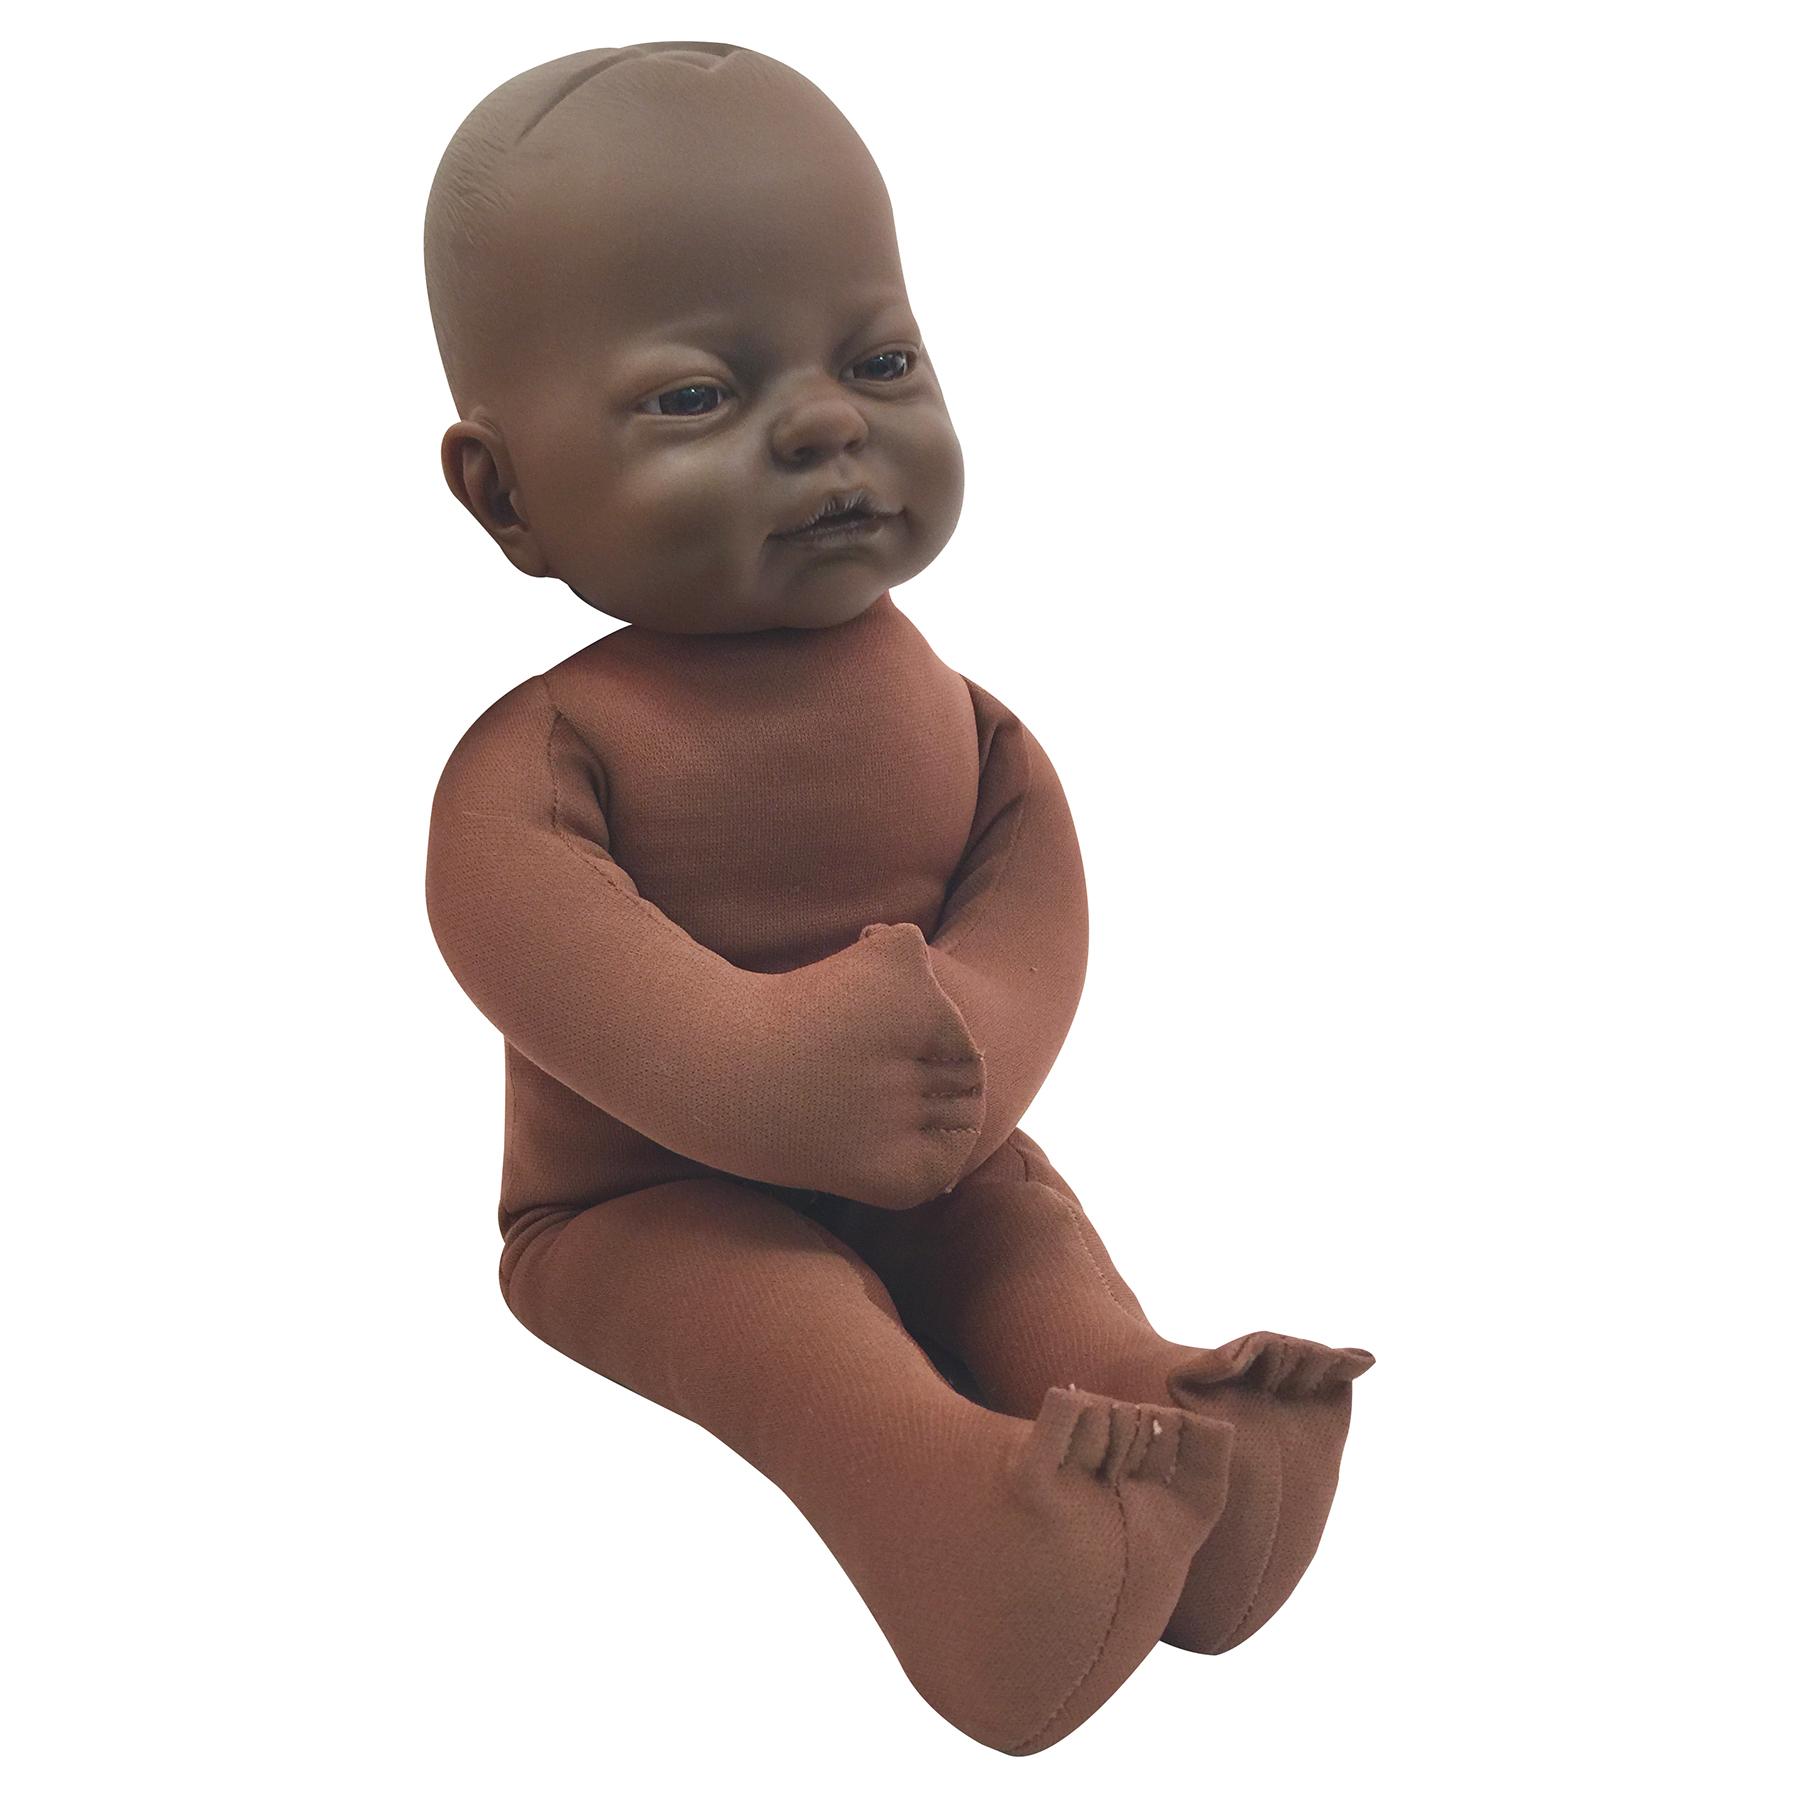 Fetal Model with dark brown skin tone, childbirth education materials, childbirth teaching tools, Childbirth Graphics, 79816